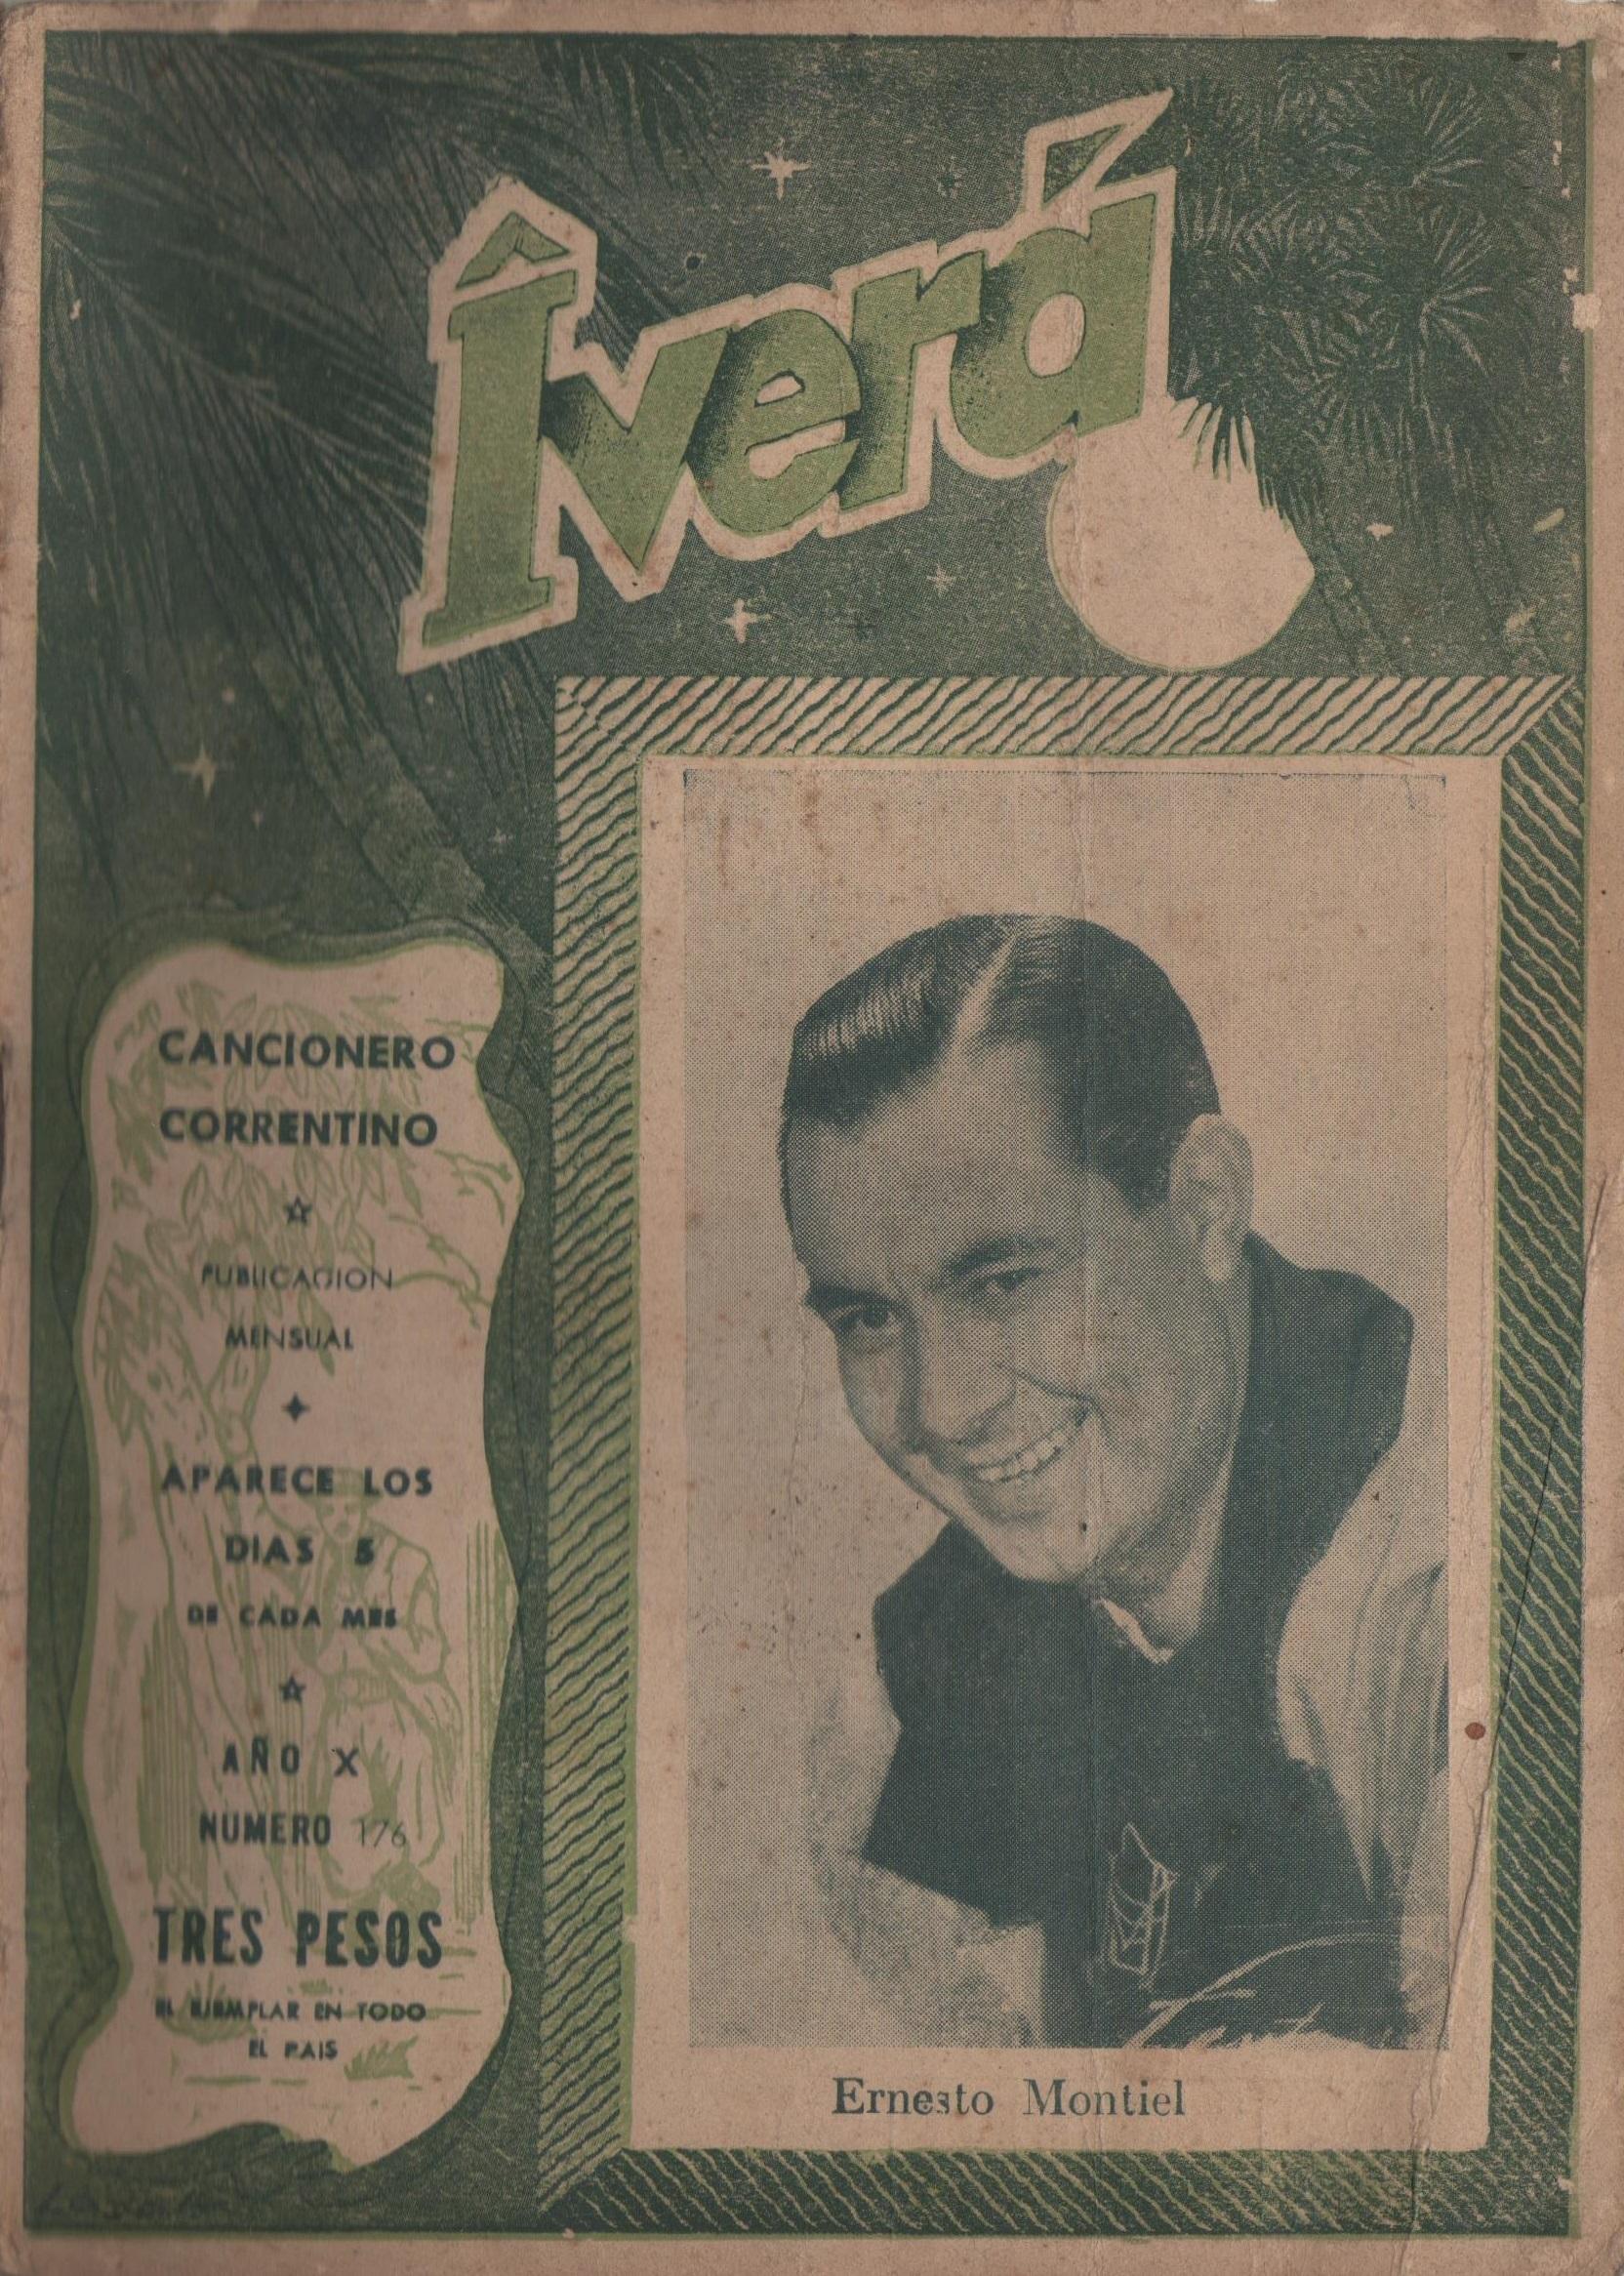 Nº 176 - 5 de Mayo de 1954